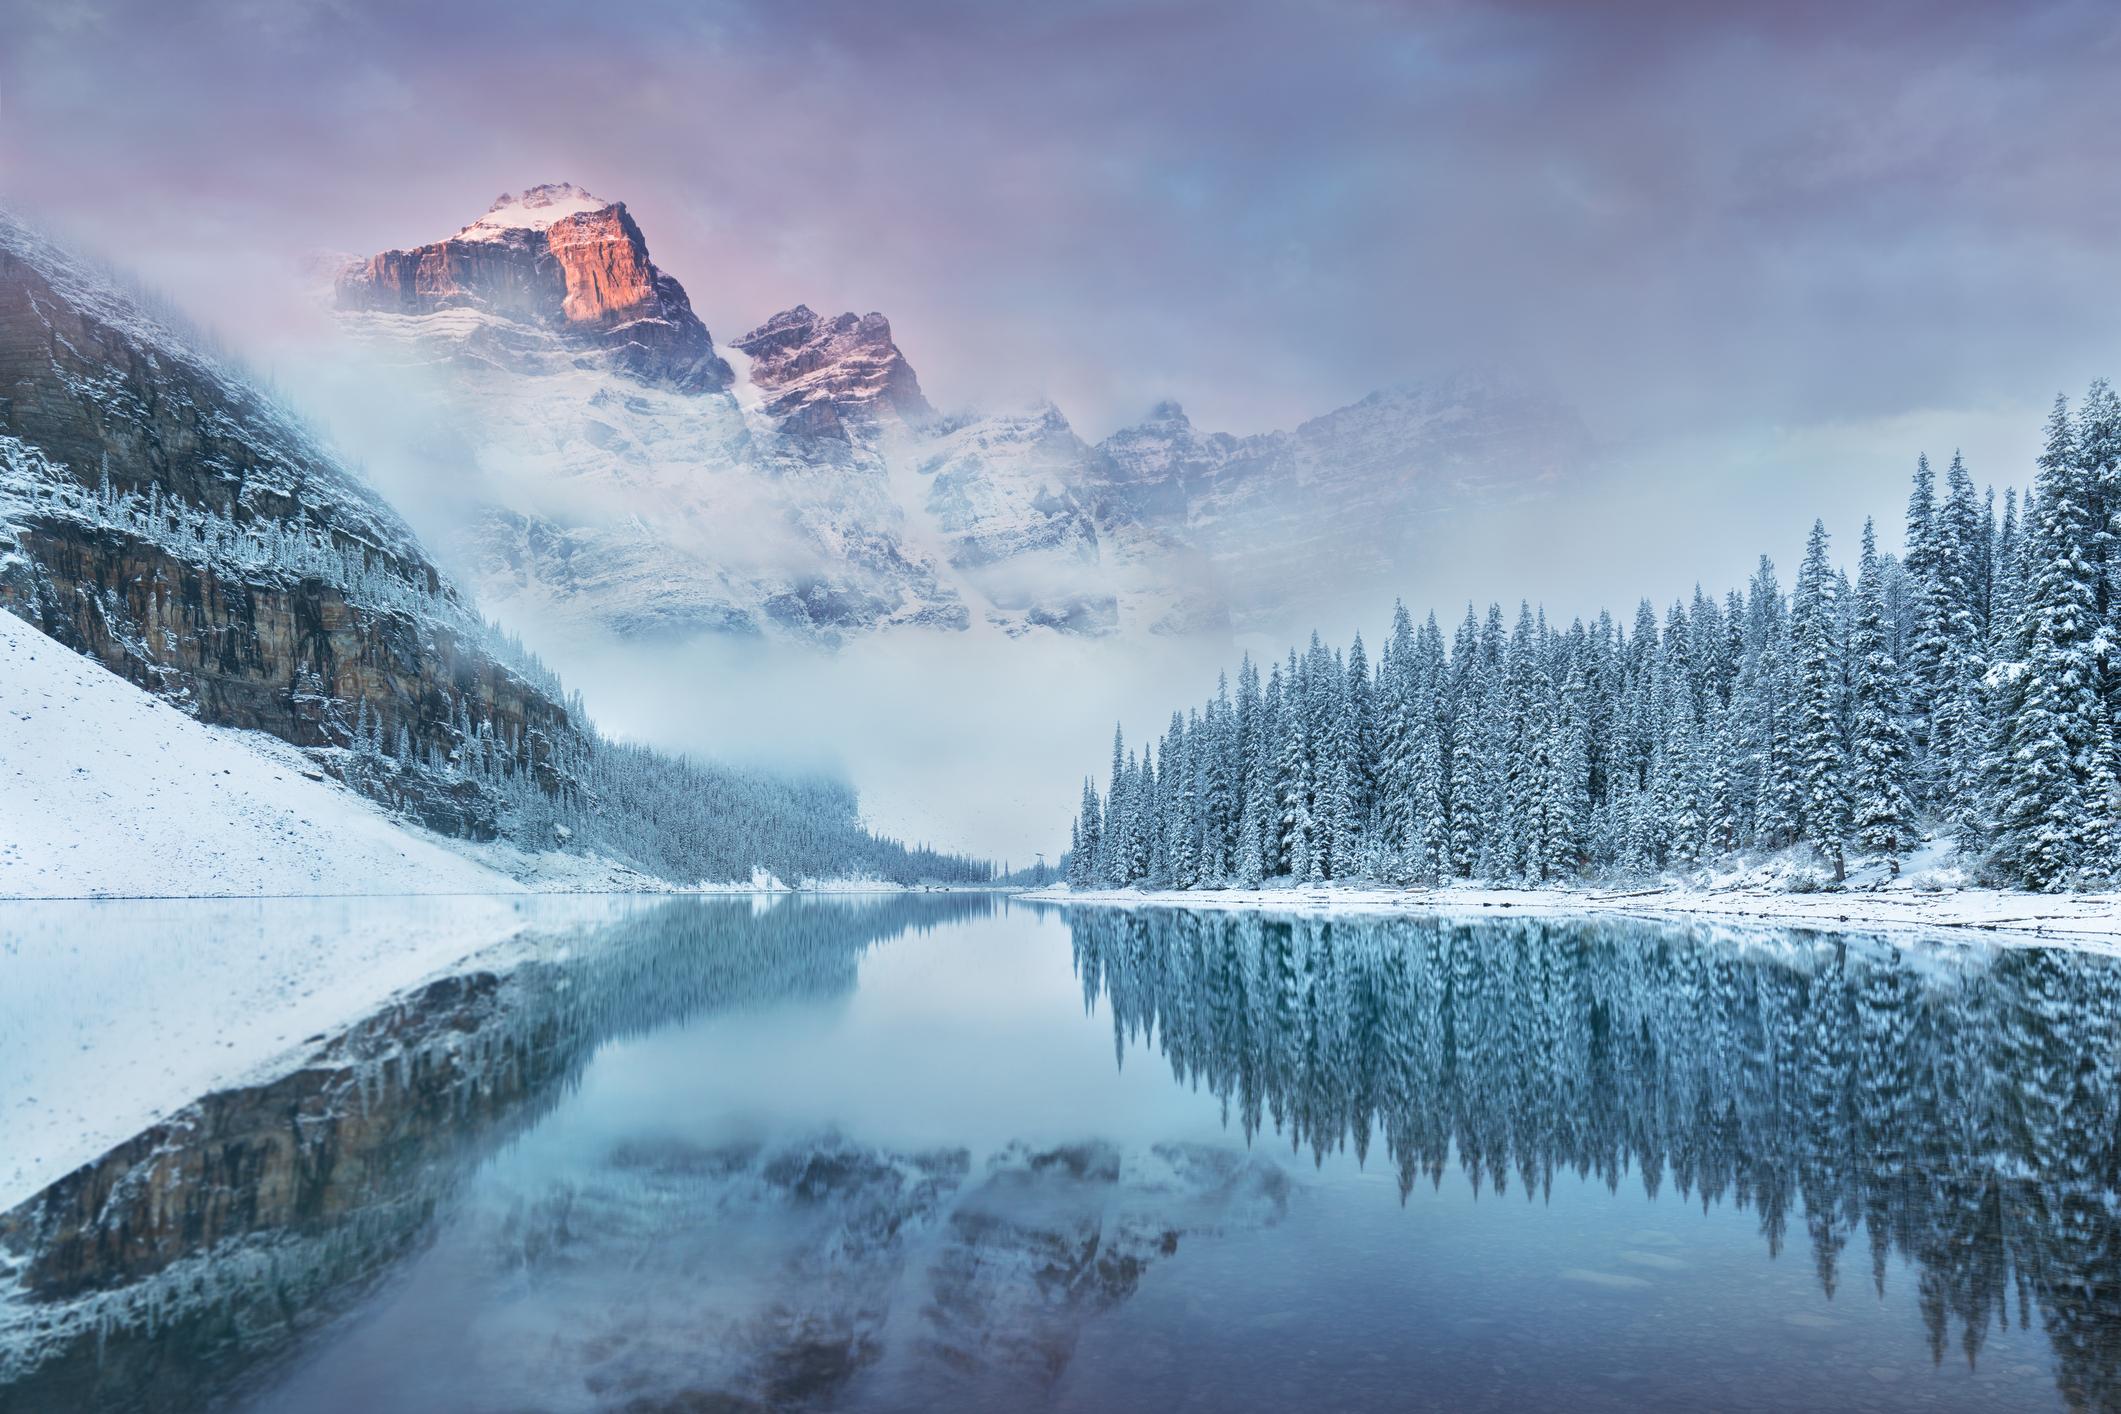 Winter in Western Canada is great